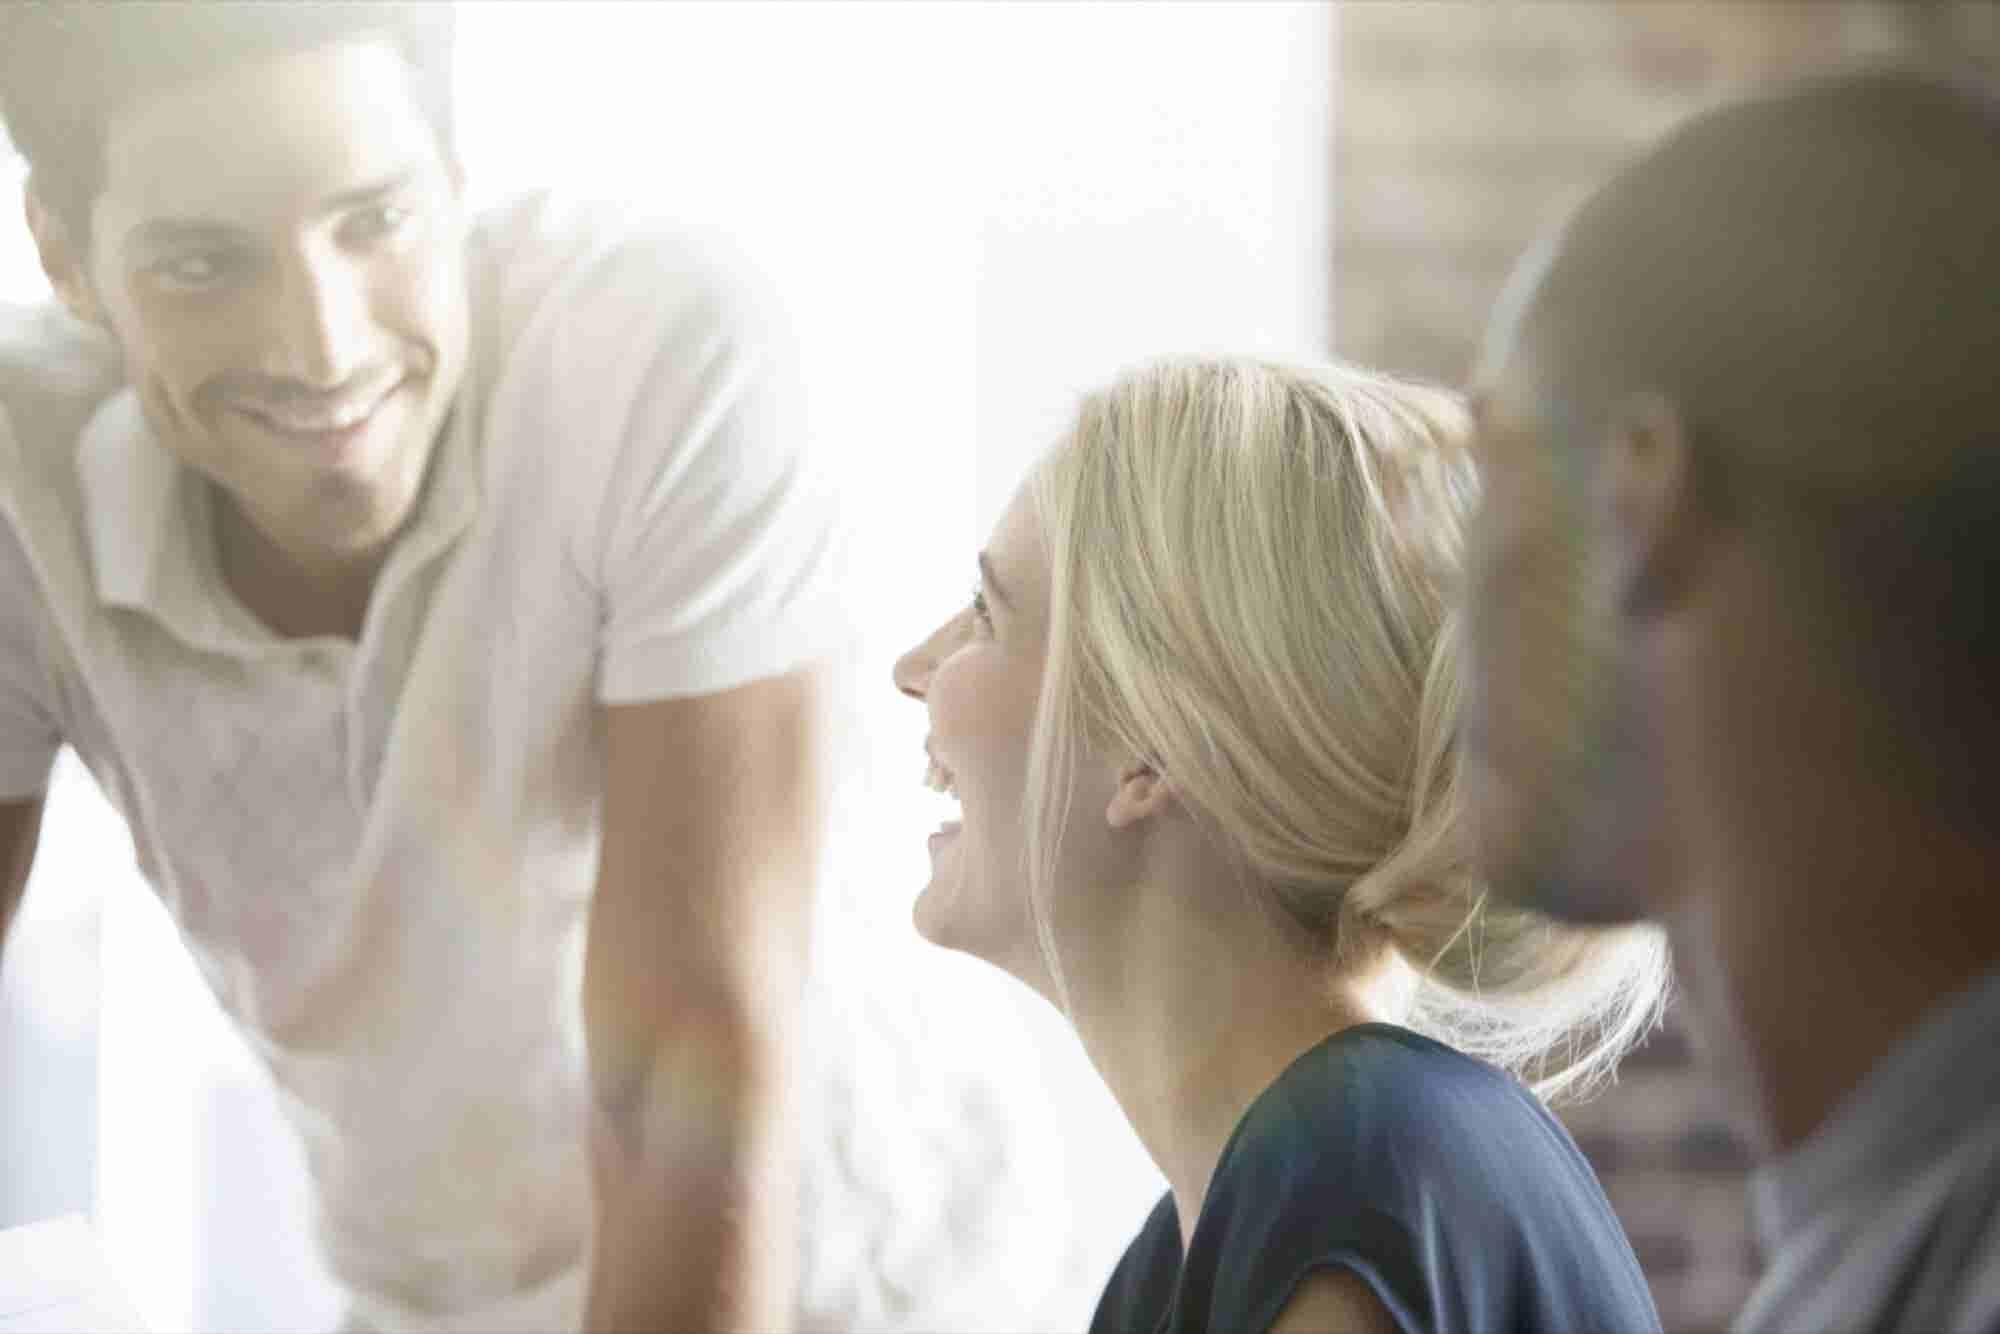 Do Extroverts Have an Advantage in Entrepreneurship?